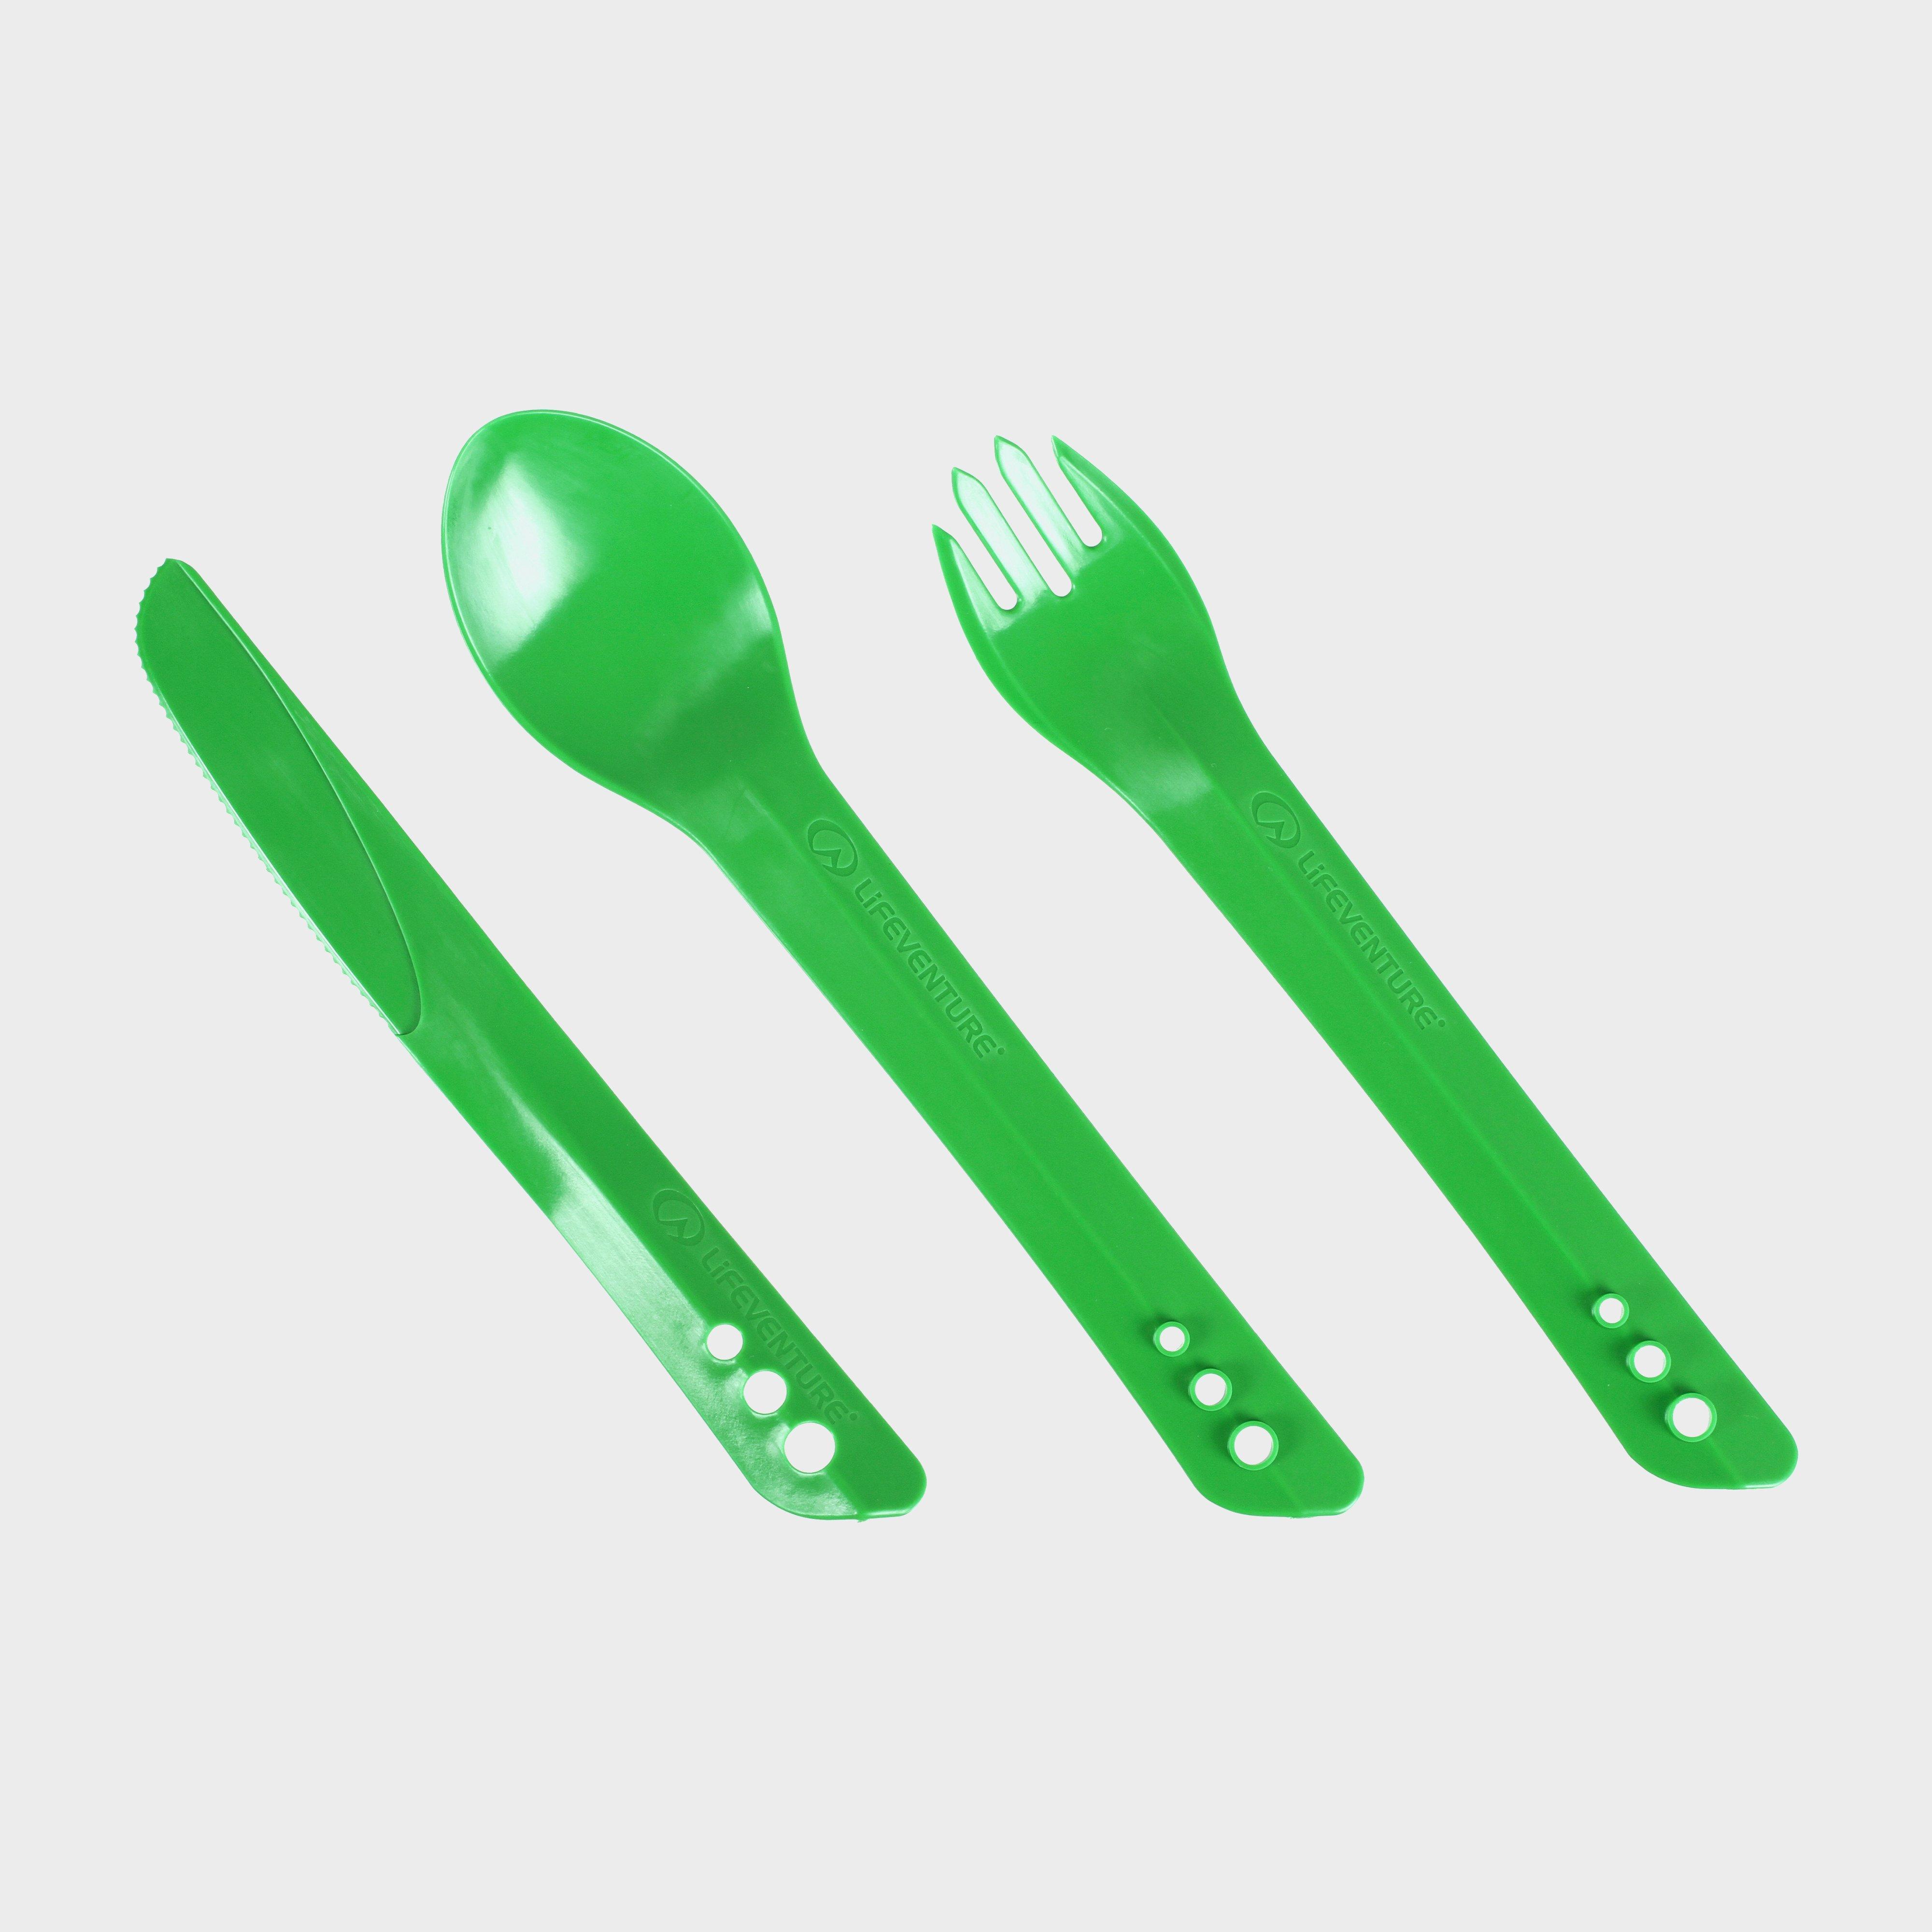 LIFEVENTURE Ellipse Camping Cutlery Set, Green/Greeen